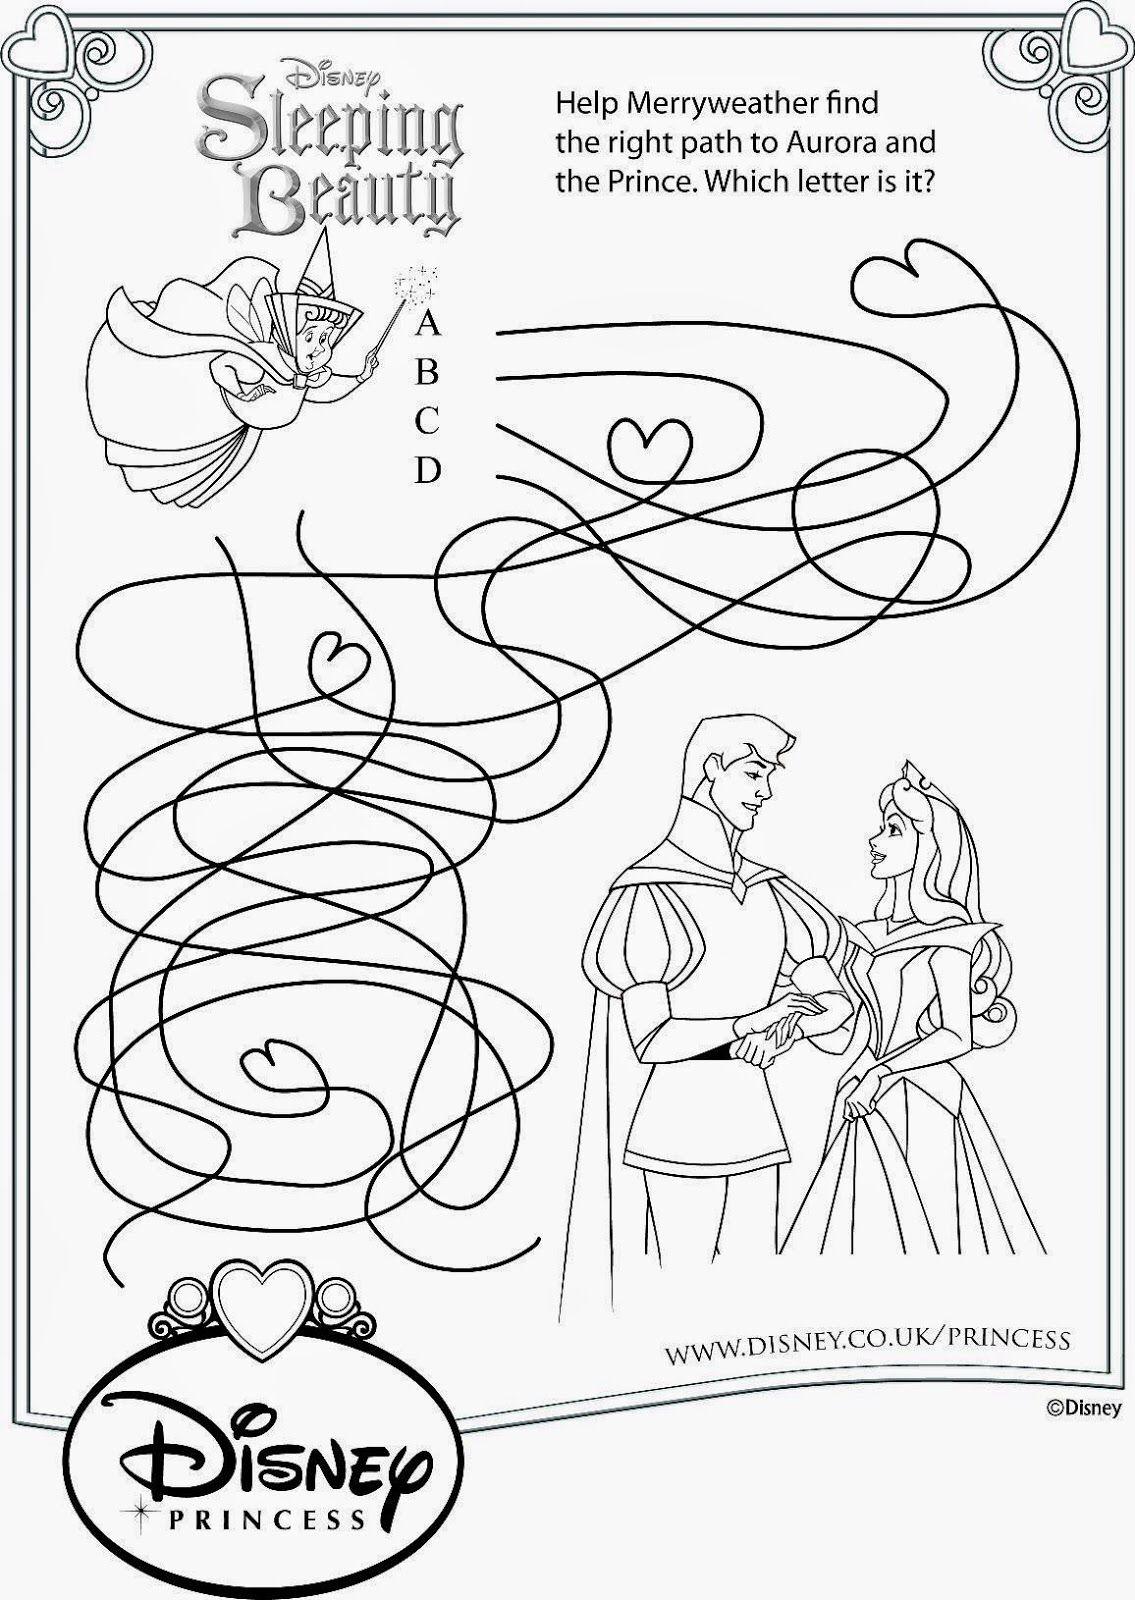 Sleeping Beauty Coloring Pages Disney Sleeping Beauty Disney